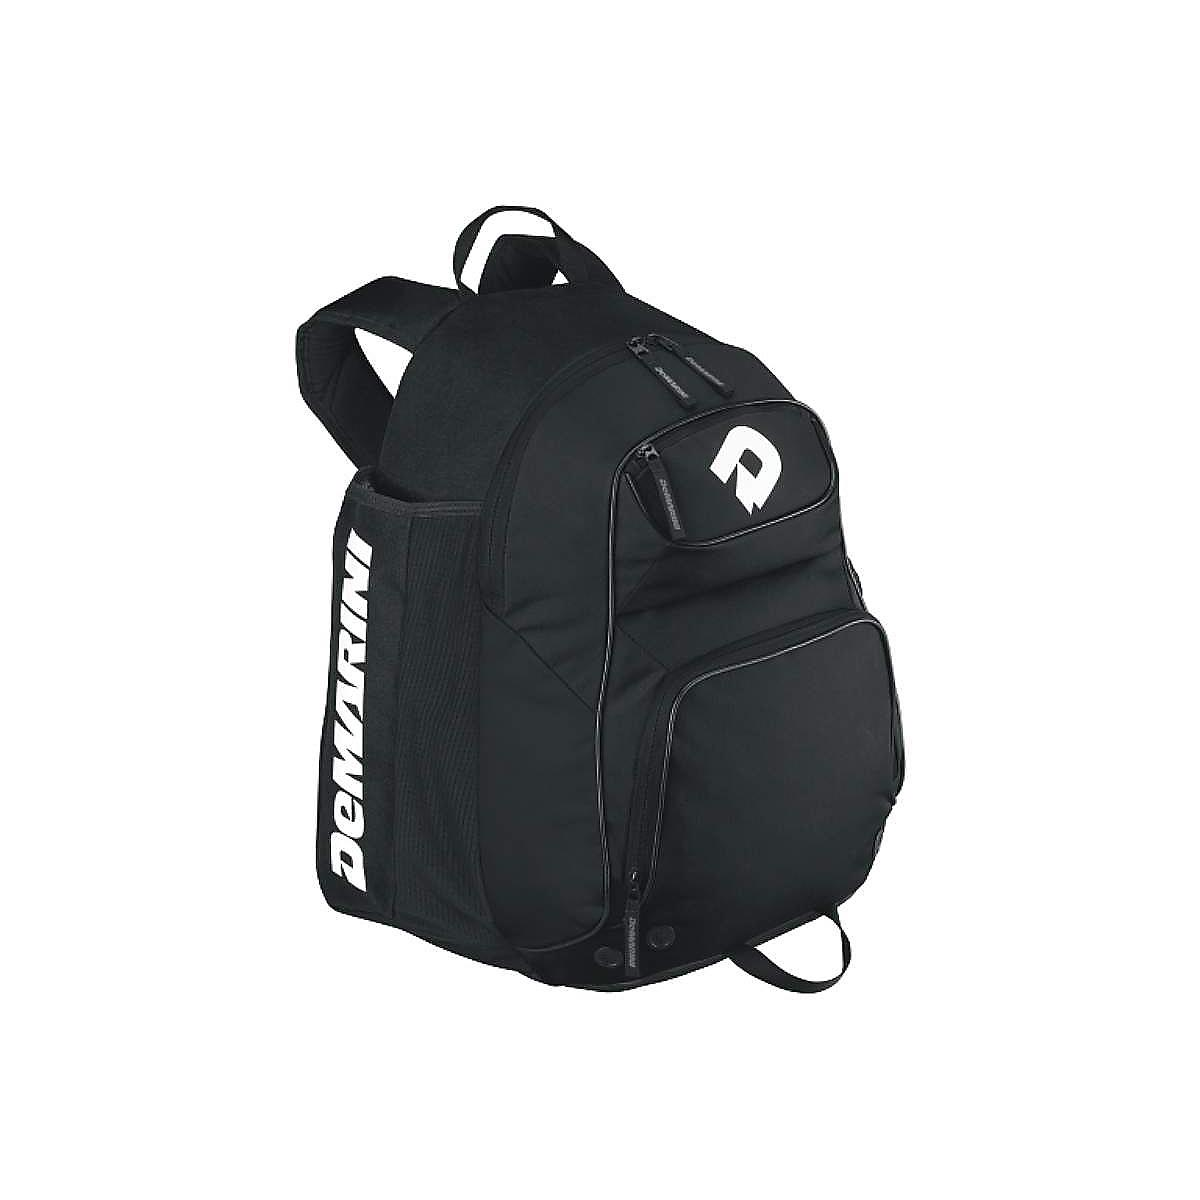 Wilson�DeMarini Aftermath Backpack